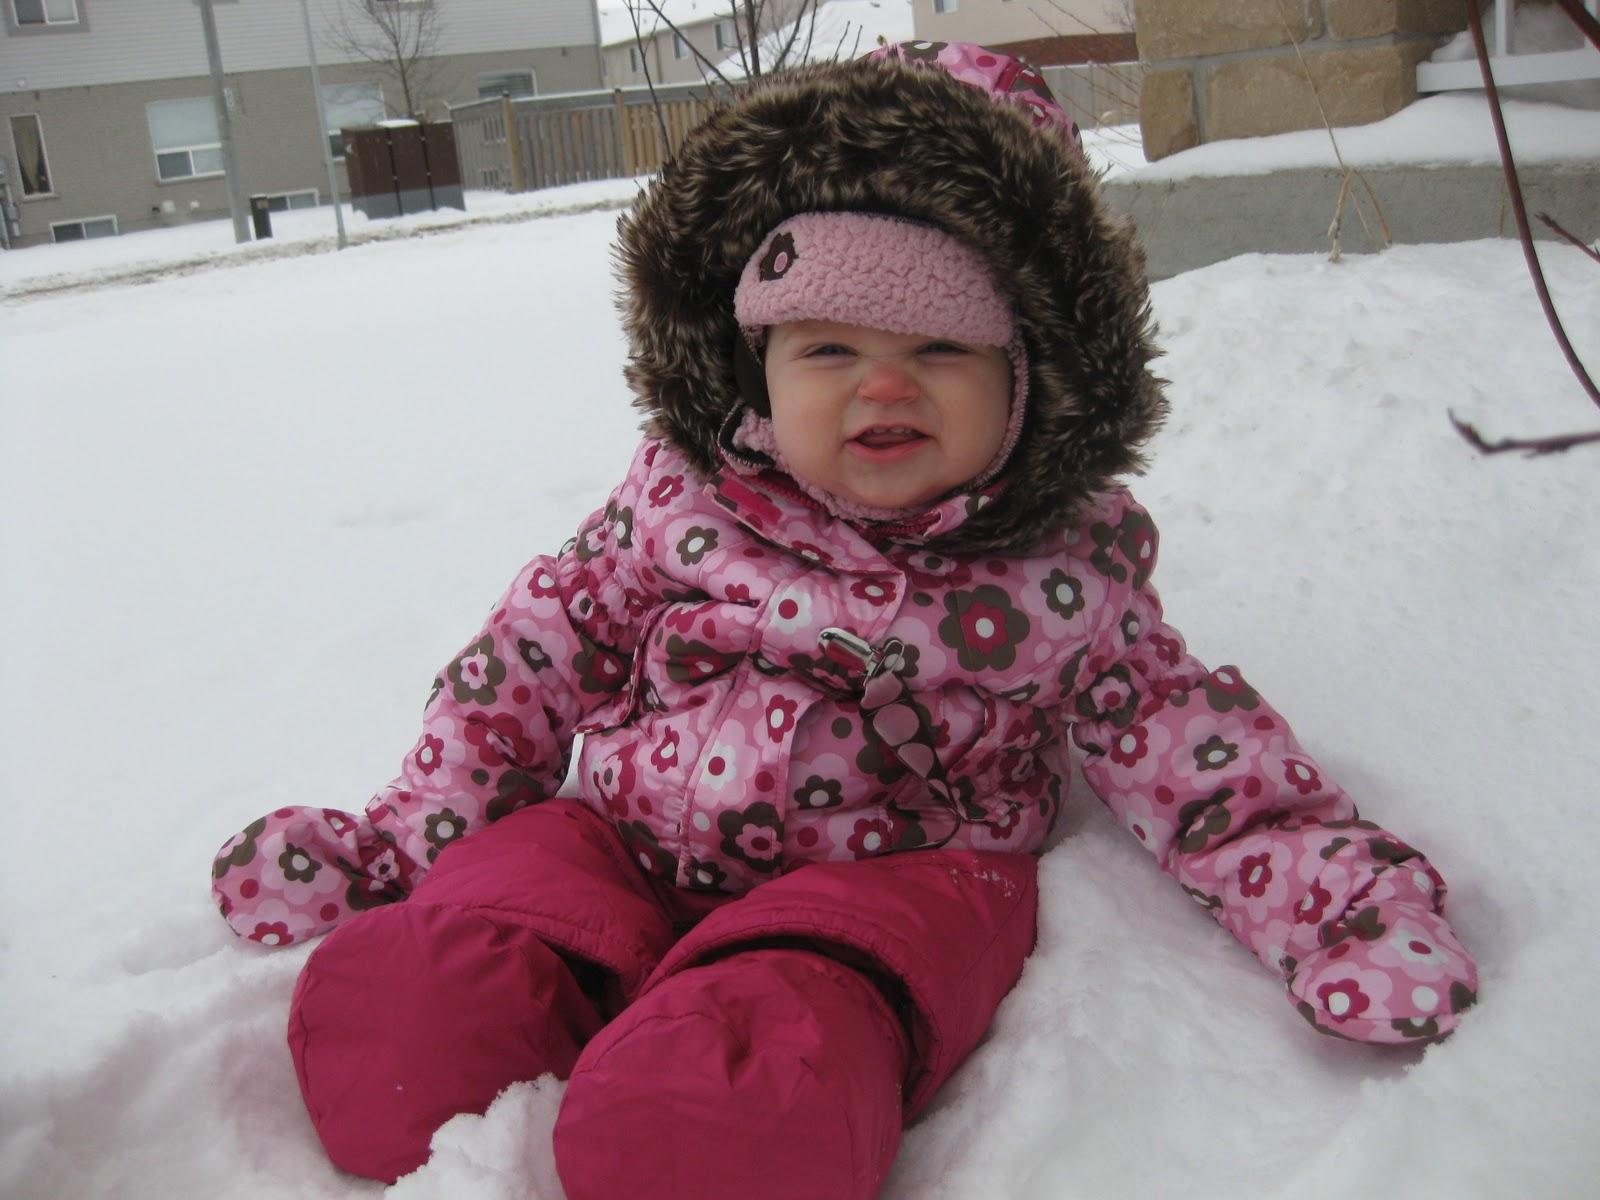 http://3.bp.blogspot.com/_IFQ-HoCR69k/TUvqg3KrFWI/AAAAAAAAABo/OUrvUsqNIJk/s1600/Julia+12.5+Months+Feb+2011+028+%25282%2529.JPG